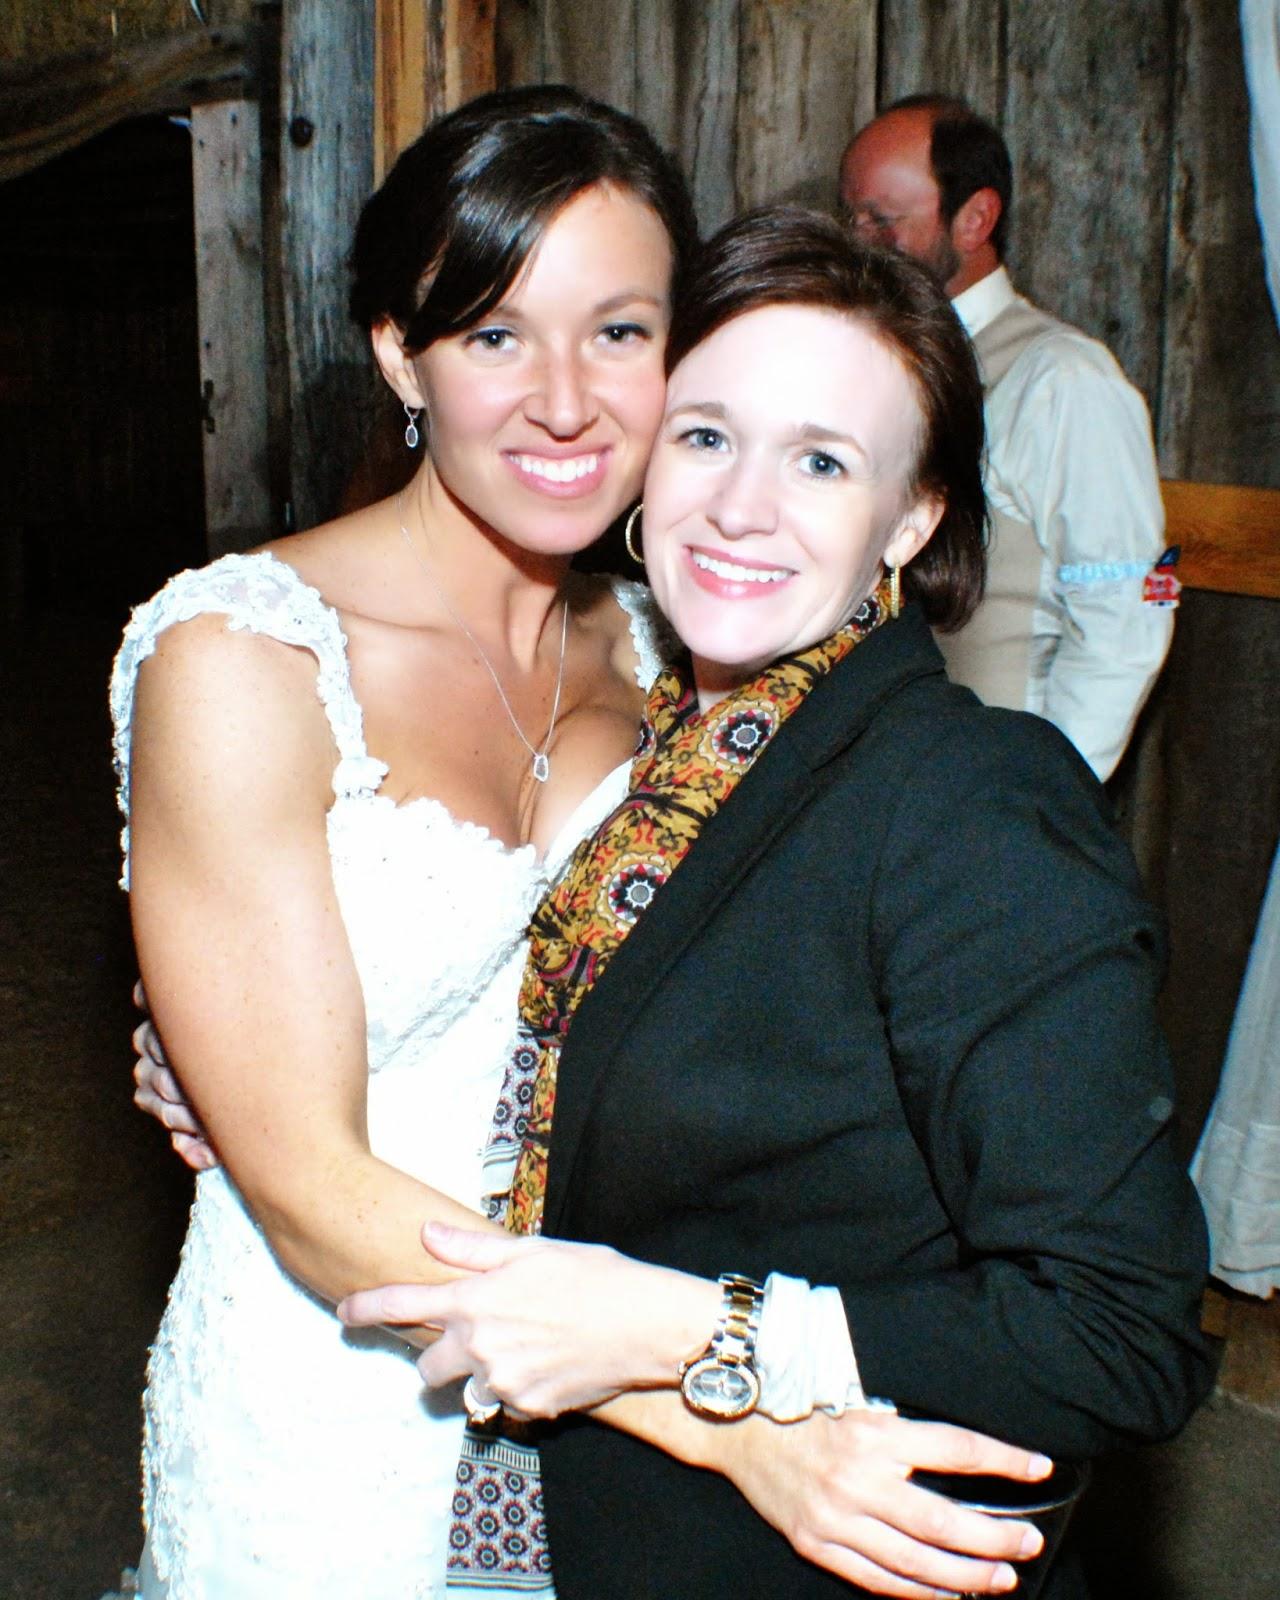 With Class LLC Wedding Coordination Party DJ - The Barn at High Point Farm - Flintstone, GA - Cheron J Douglas CWP - Certified Wedding Planner